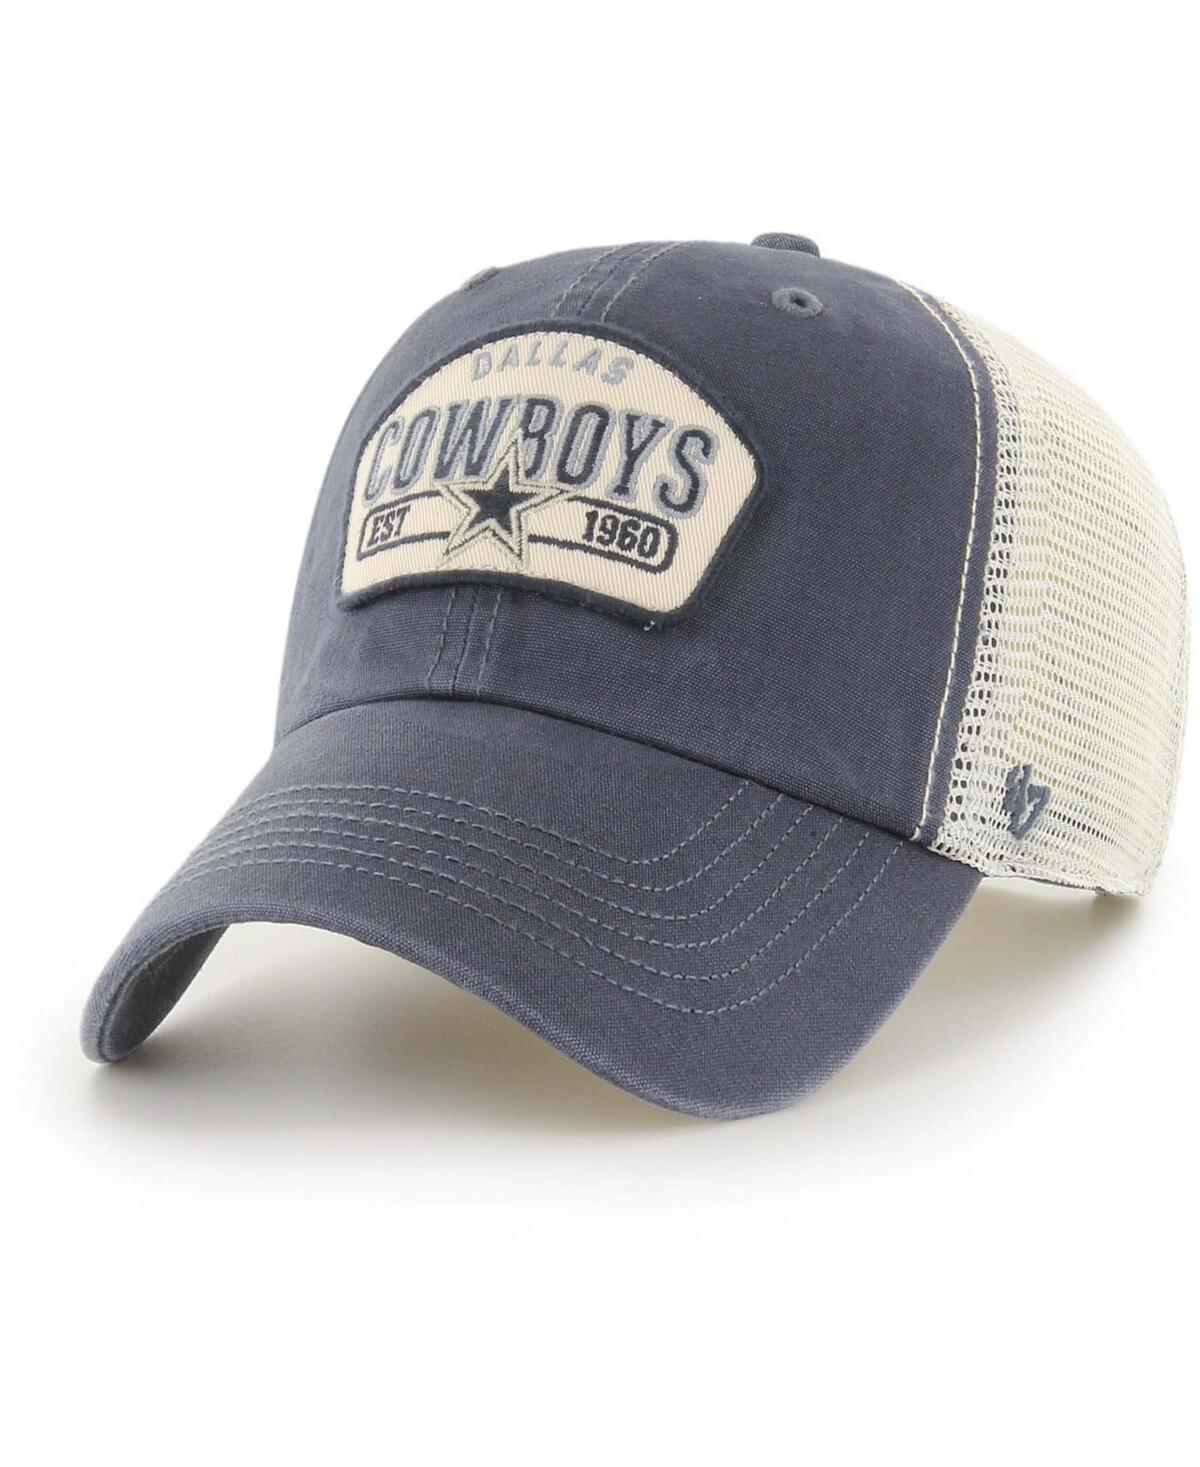 Mens Navy, White Dallas Cowboys Penwald Cleanup Trucker Snapback Hat